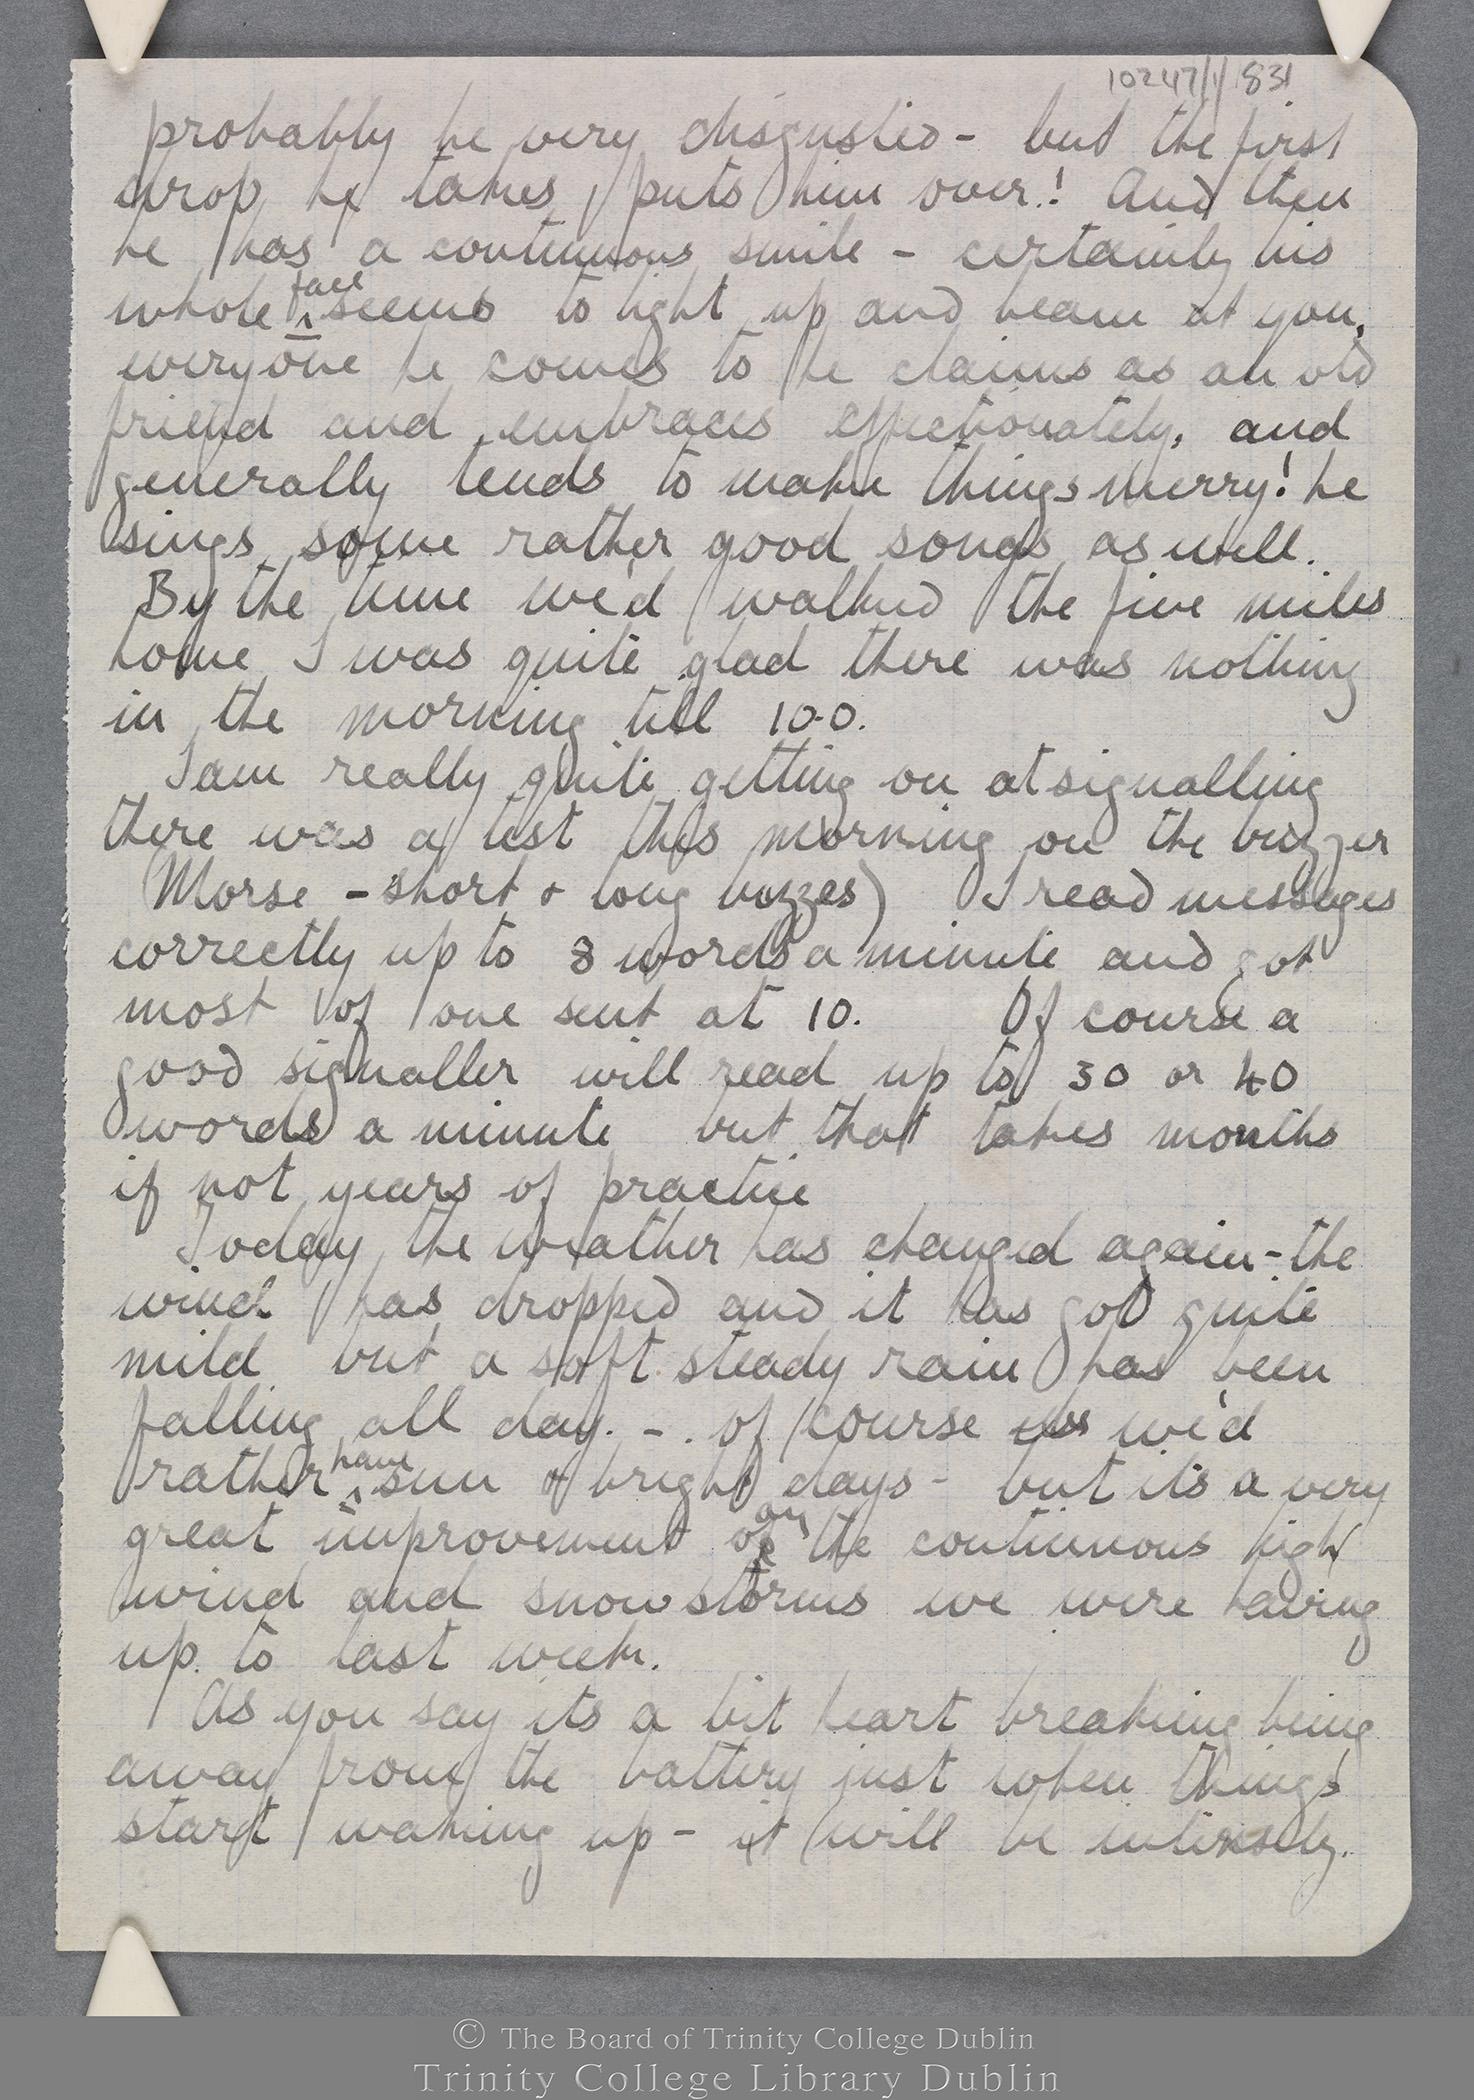 TCD MS 10247/1/831 folio 6 recto